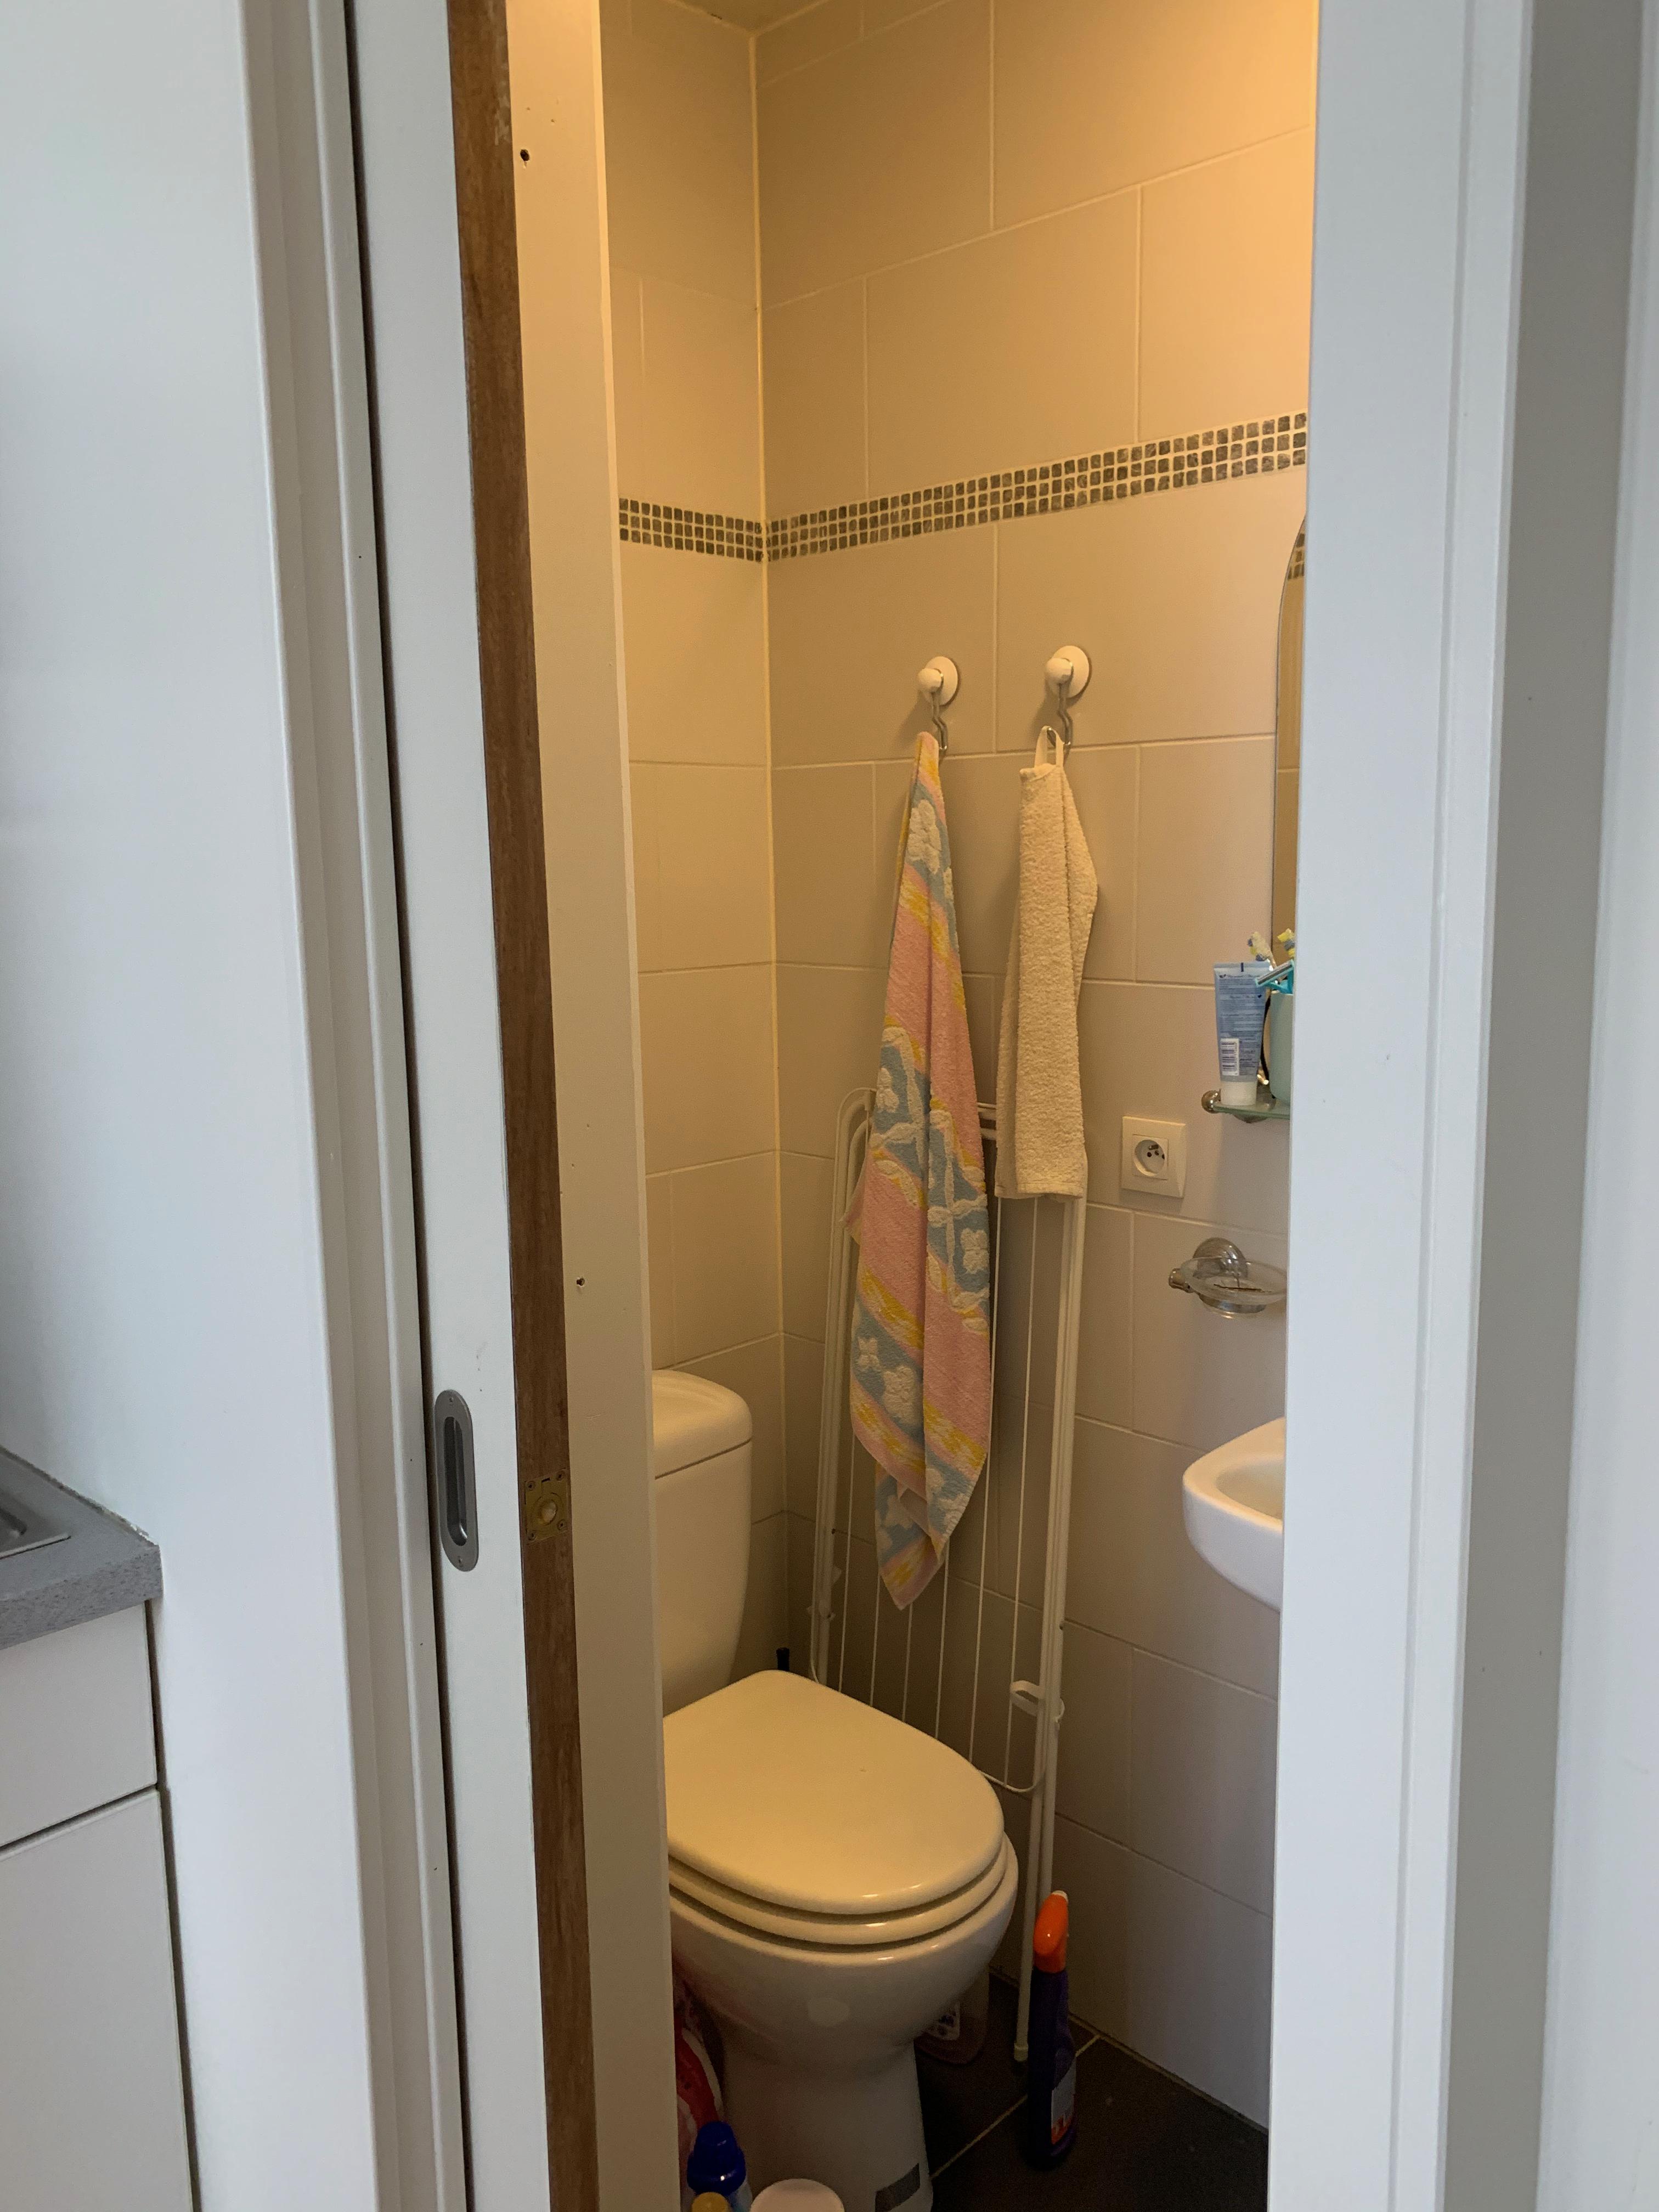 LP2-0201 - toilet